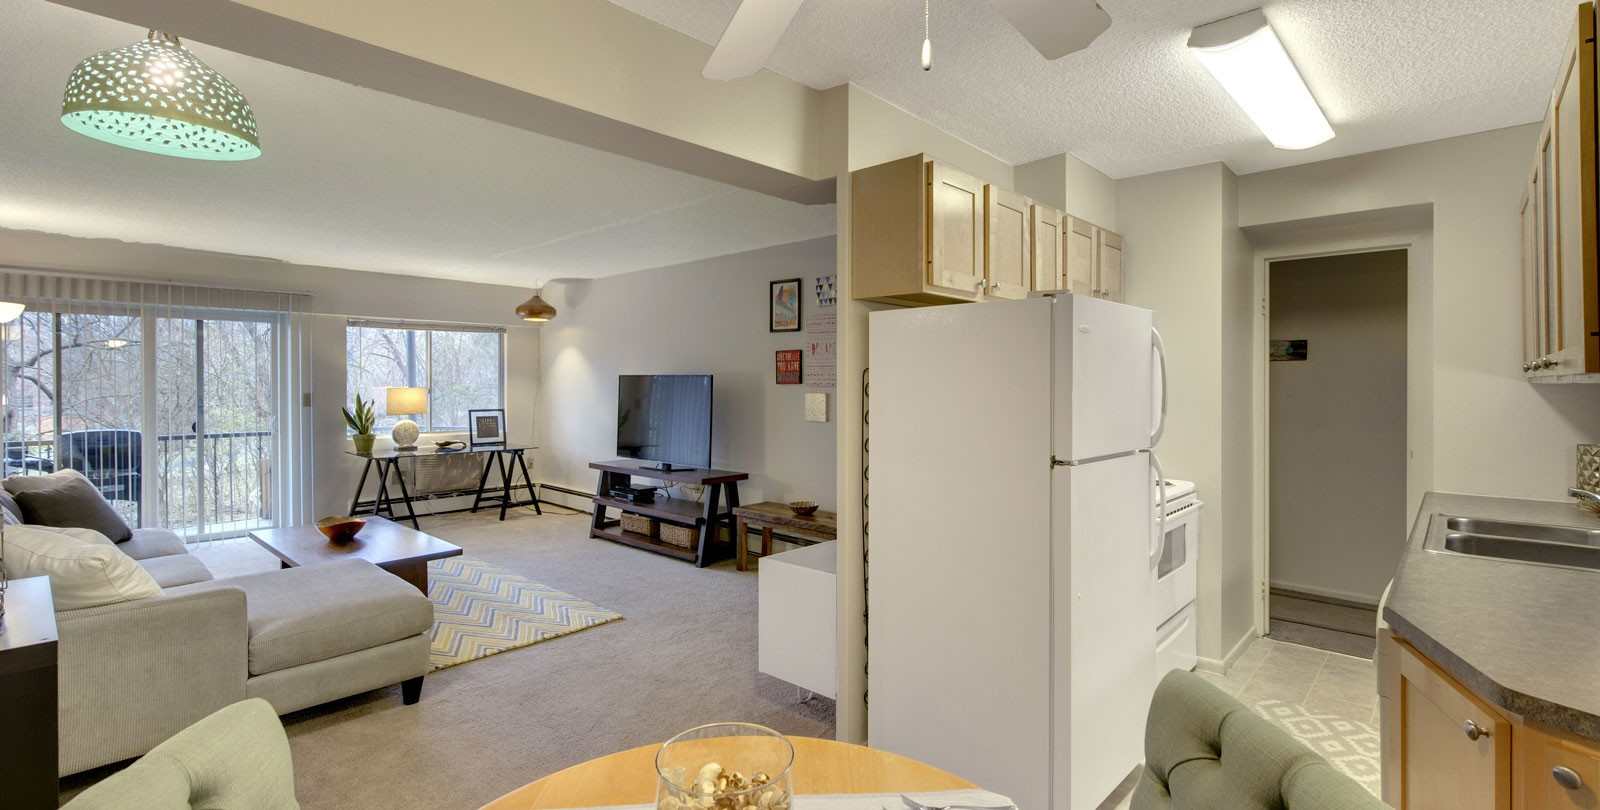 Apartments Near Minnetonka Park Towers for Minnetonka Students in Minnetonka, MN